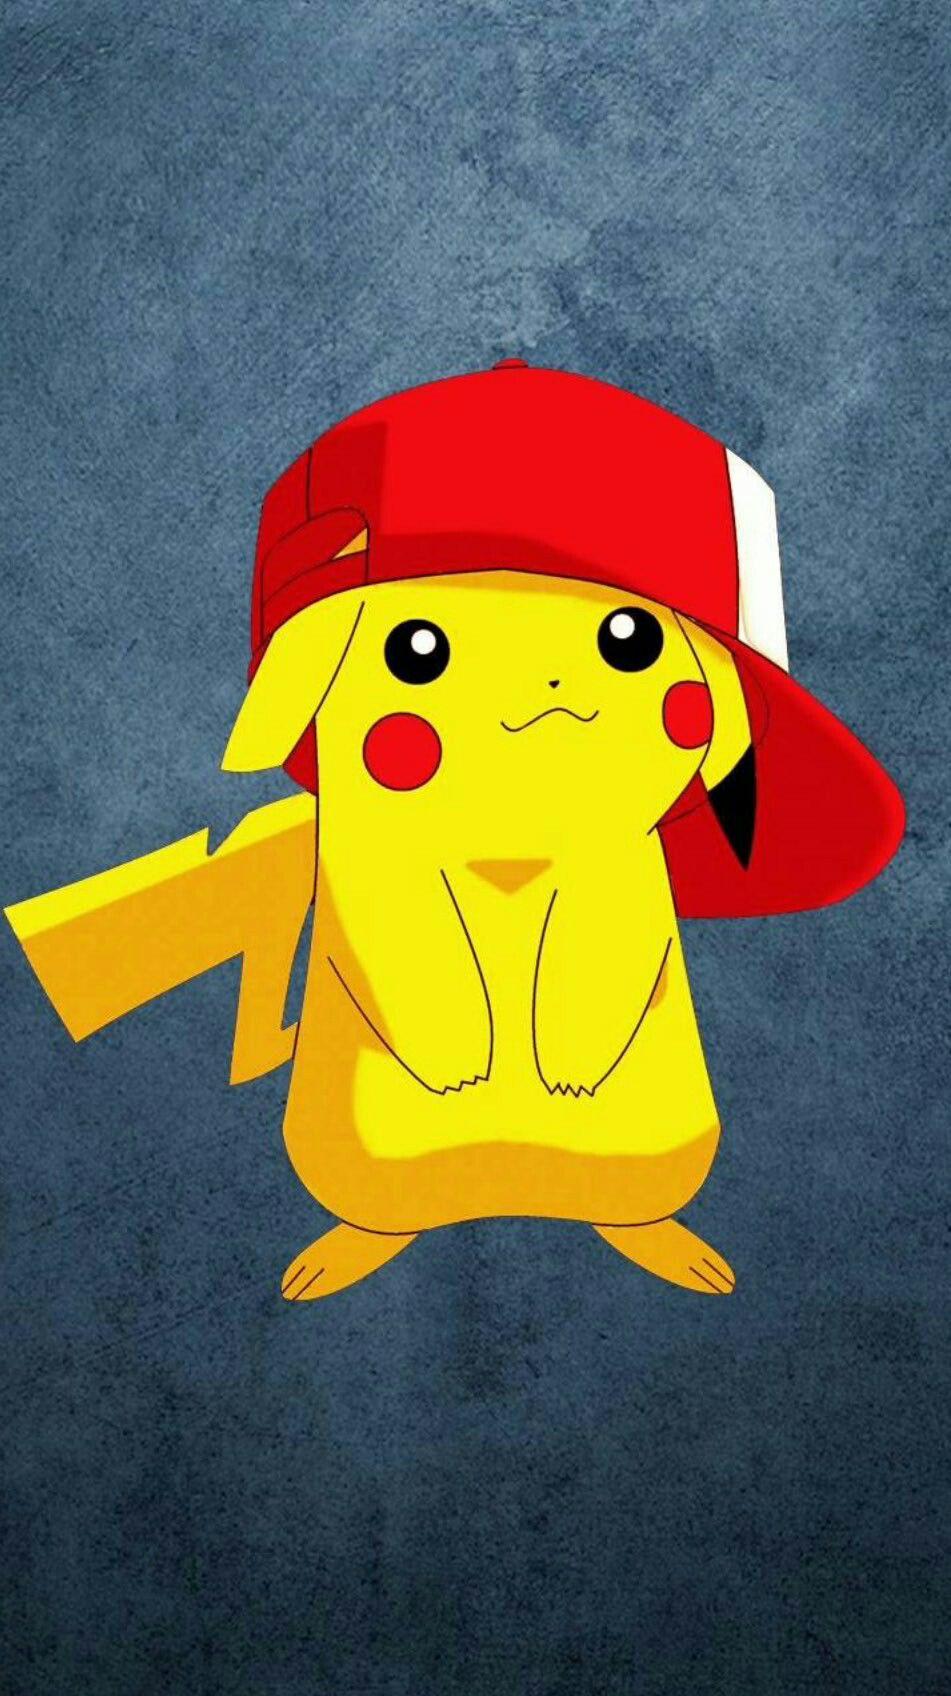 Pik♡chu   Iphone wallpaper pokemon, Pikachu wallpaper